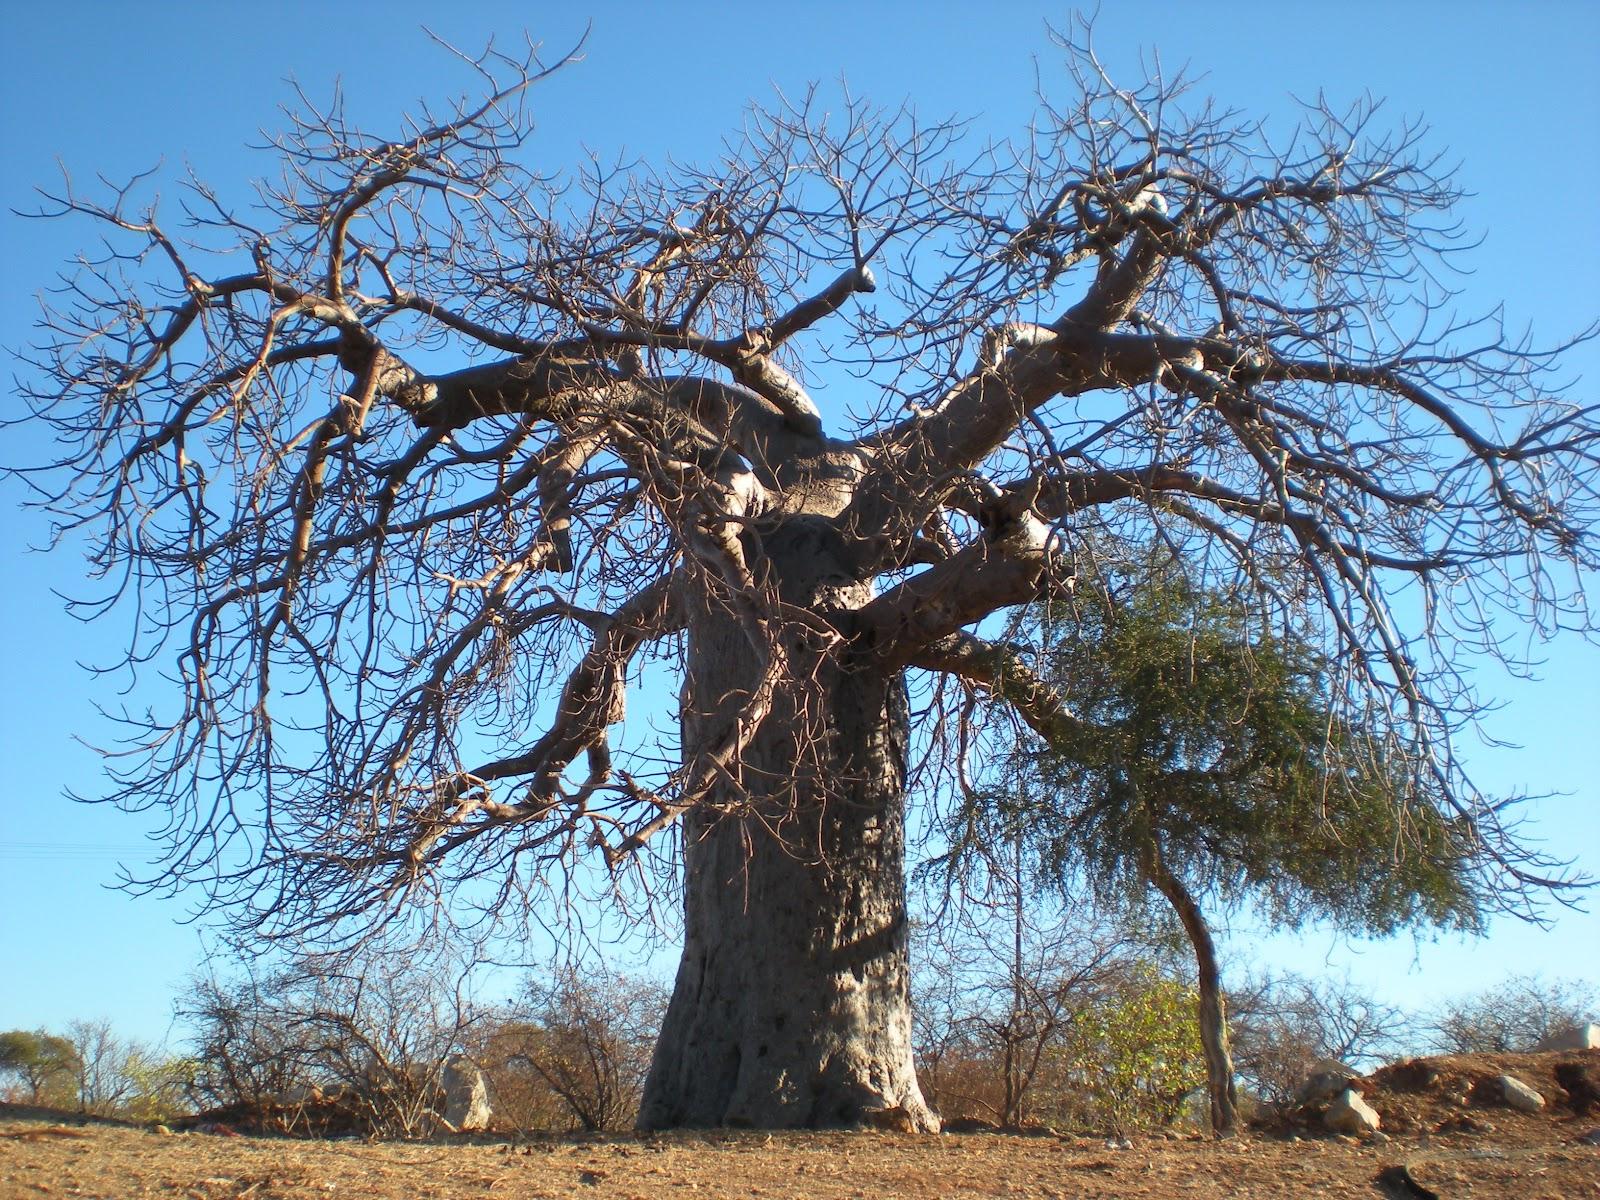 HECK'S MISSIONARY BLOG: BAOBAB TREES